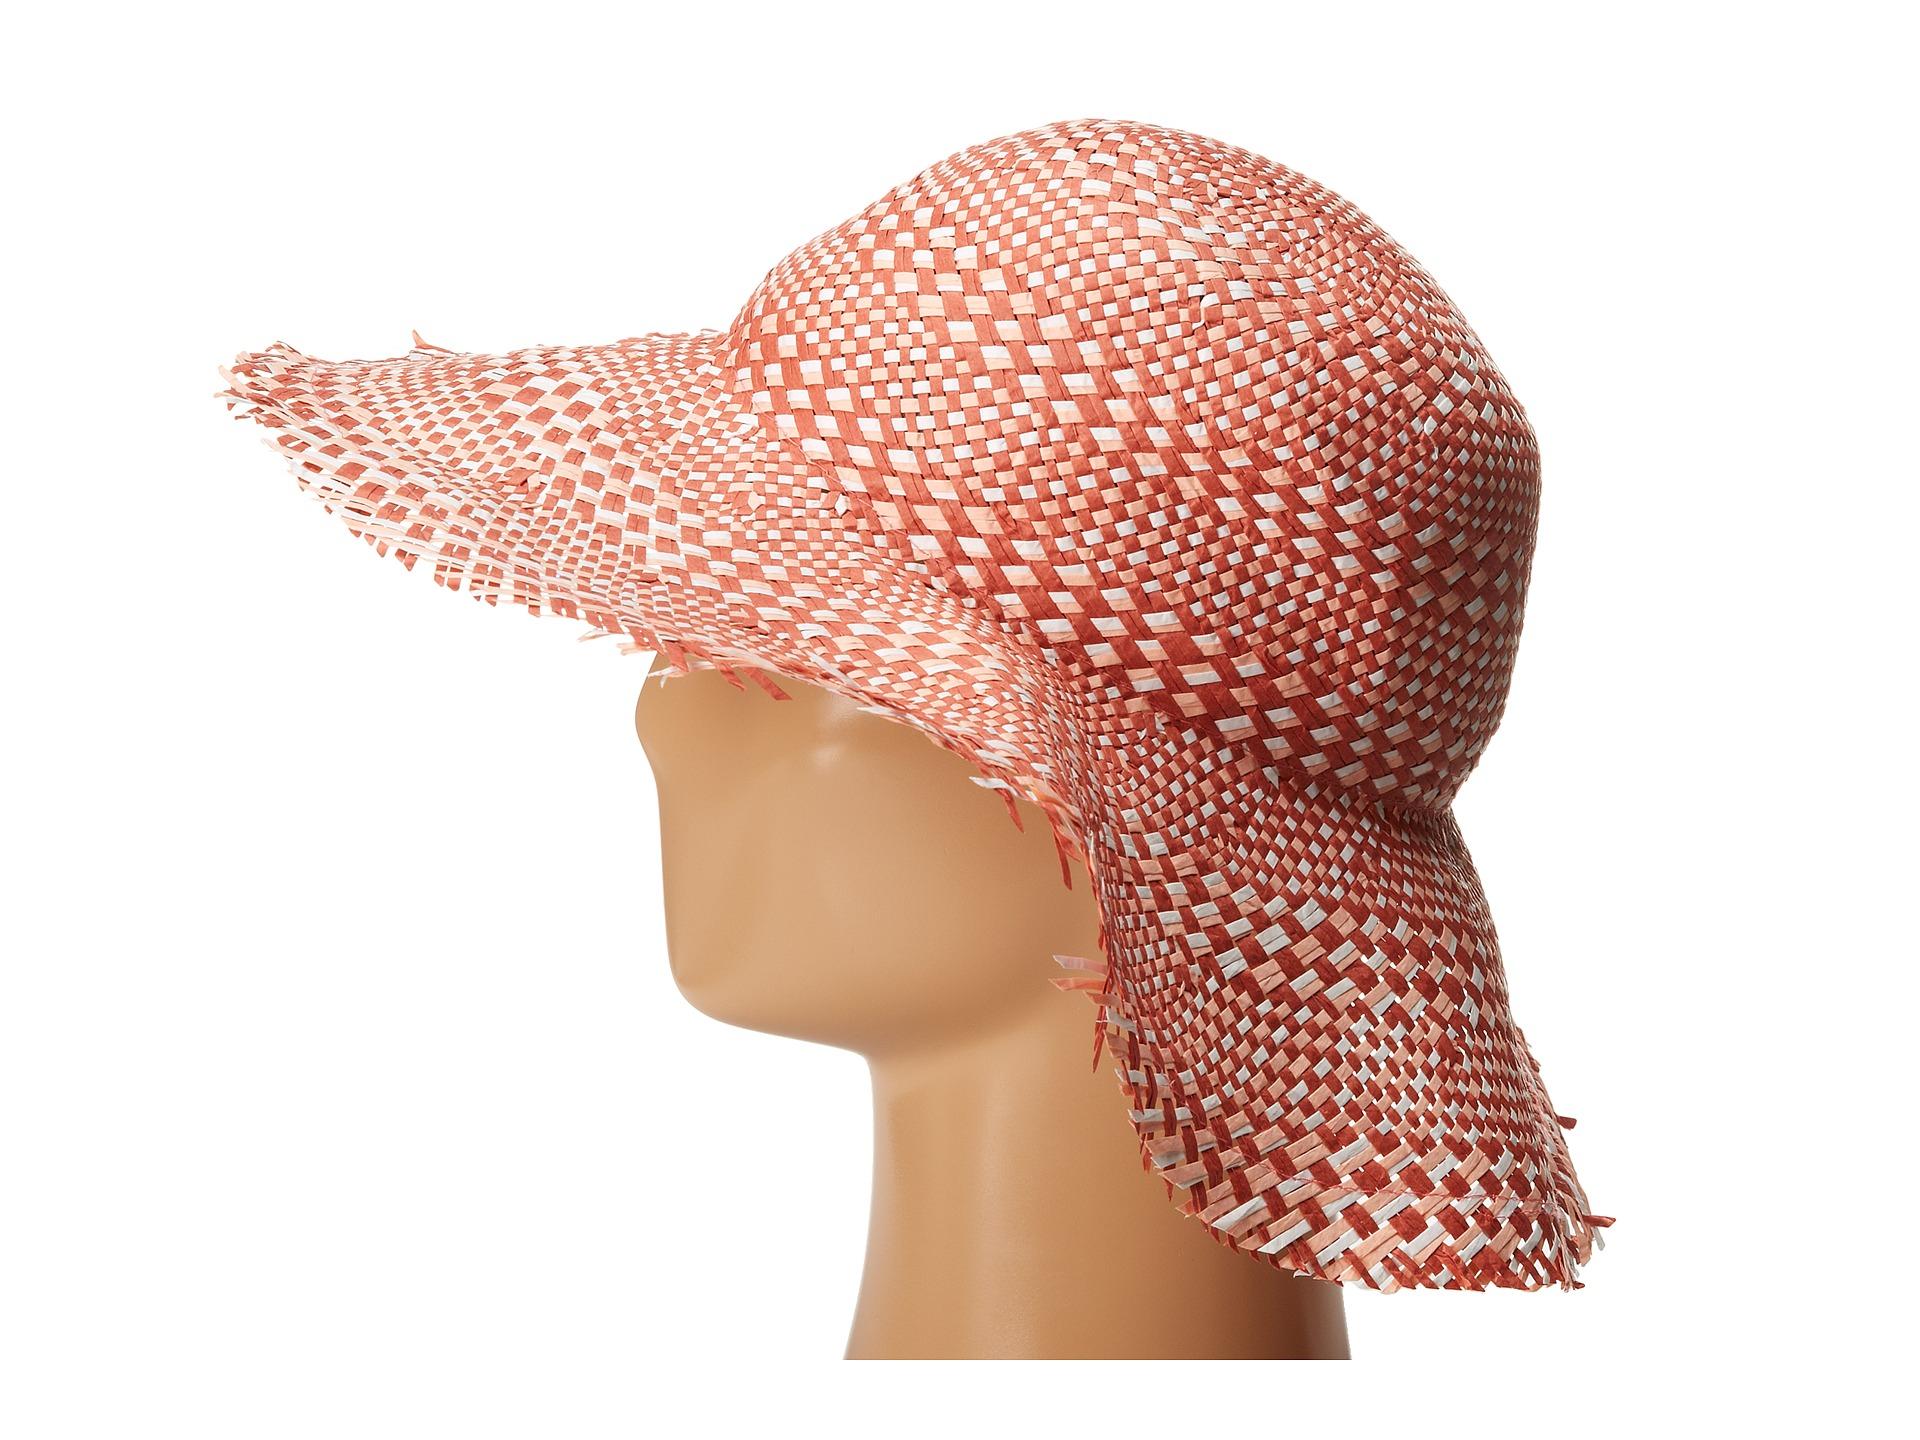 cad3bfe66 Women's Pink Multi Floppy Hat